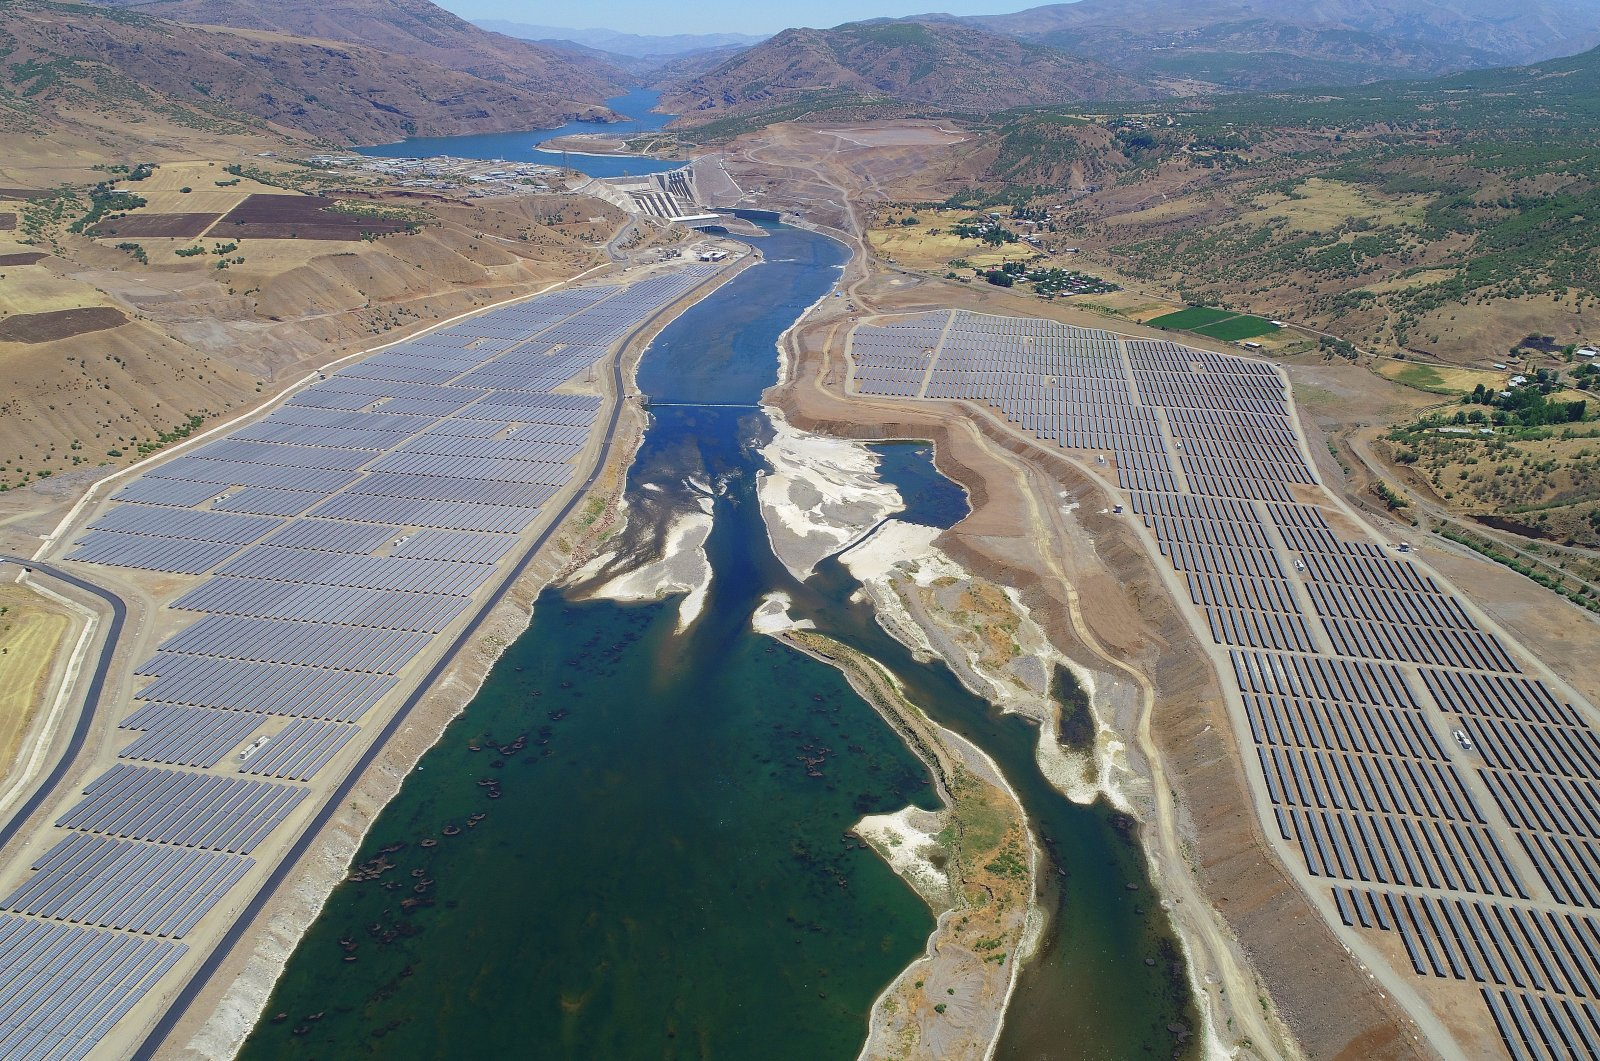 Solar panels are seen in the eastern province of Bingöl, Turkey, June 25, 2021. (AA Photo)